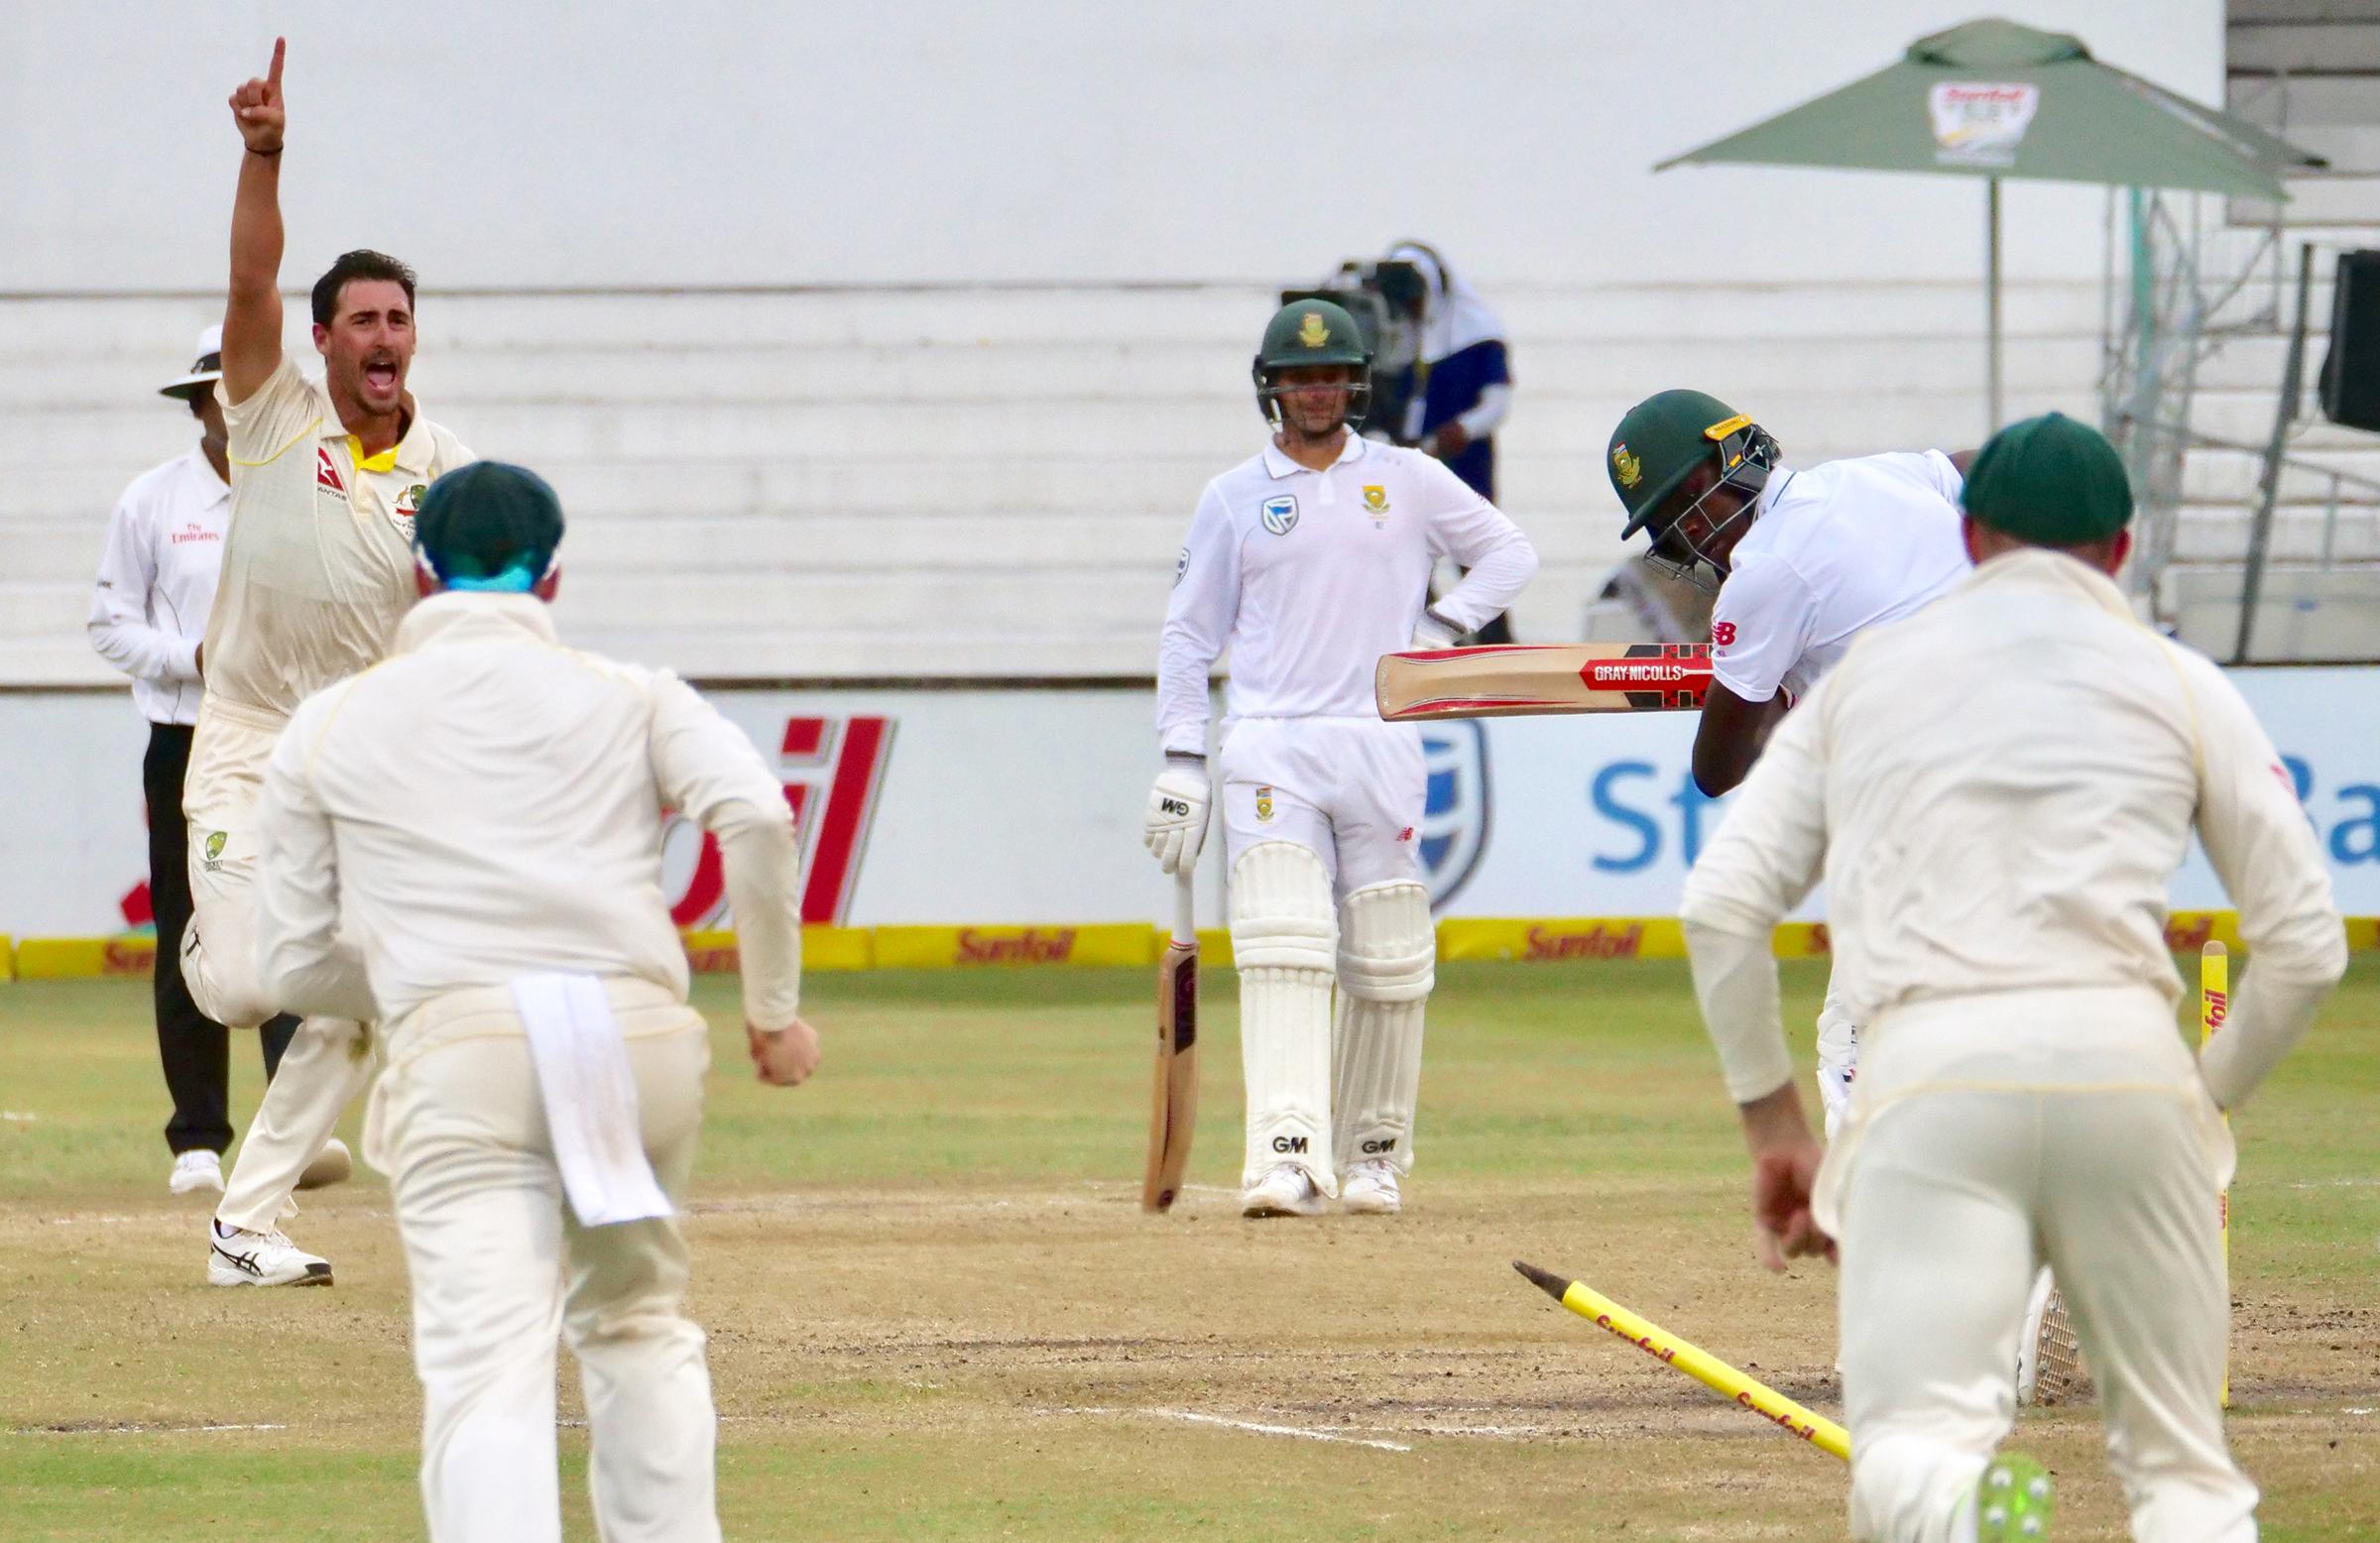 Starc flattens Rabada's off stump // Cricket Network